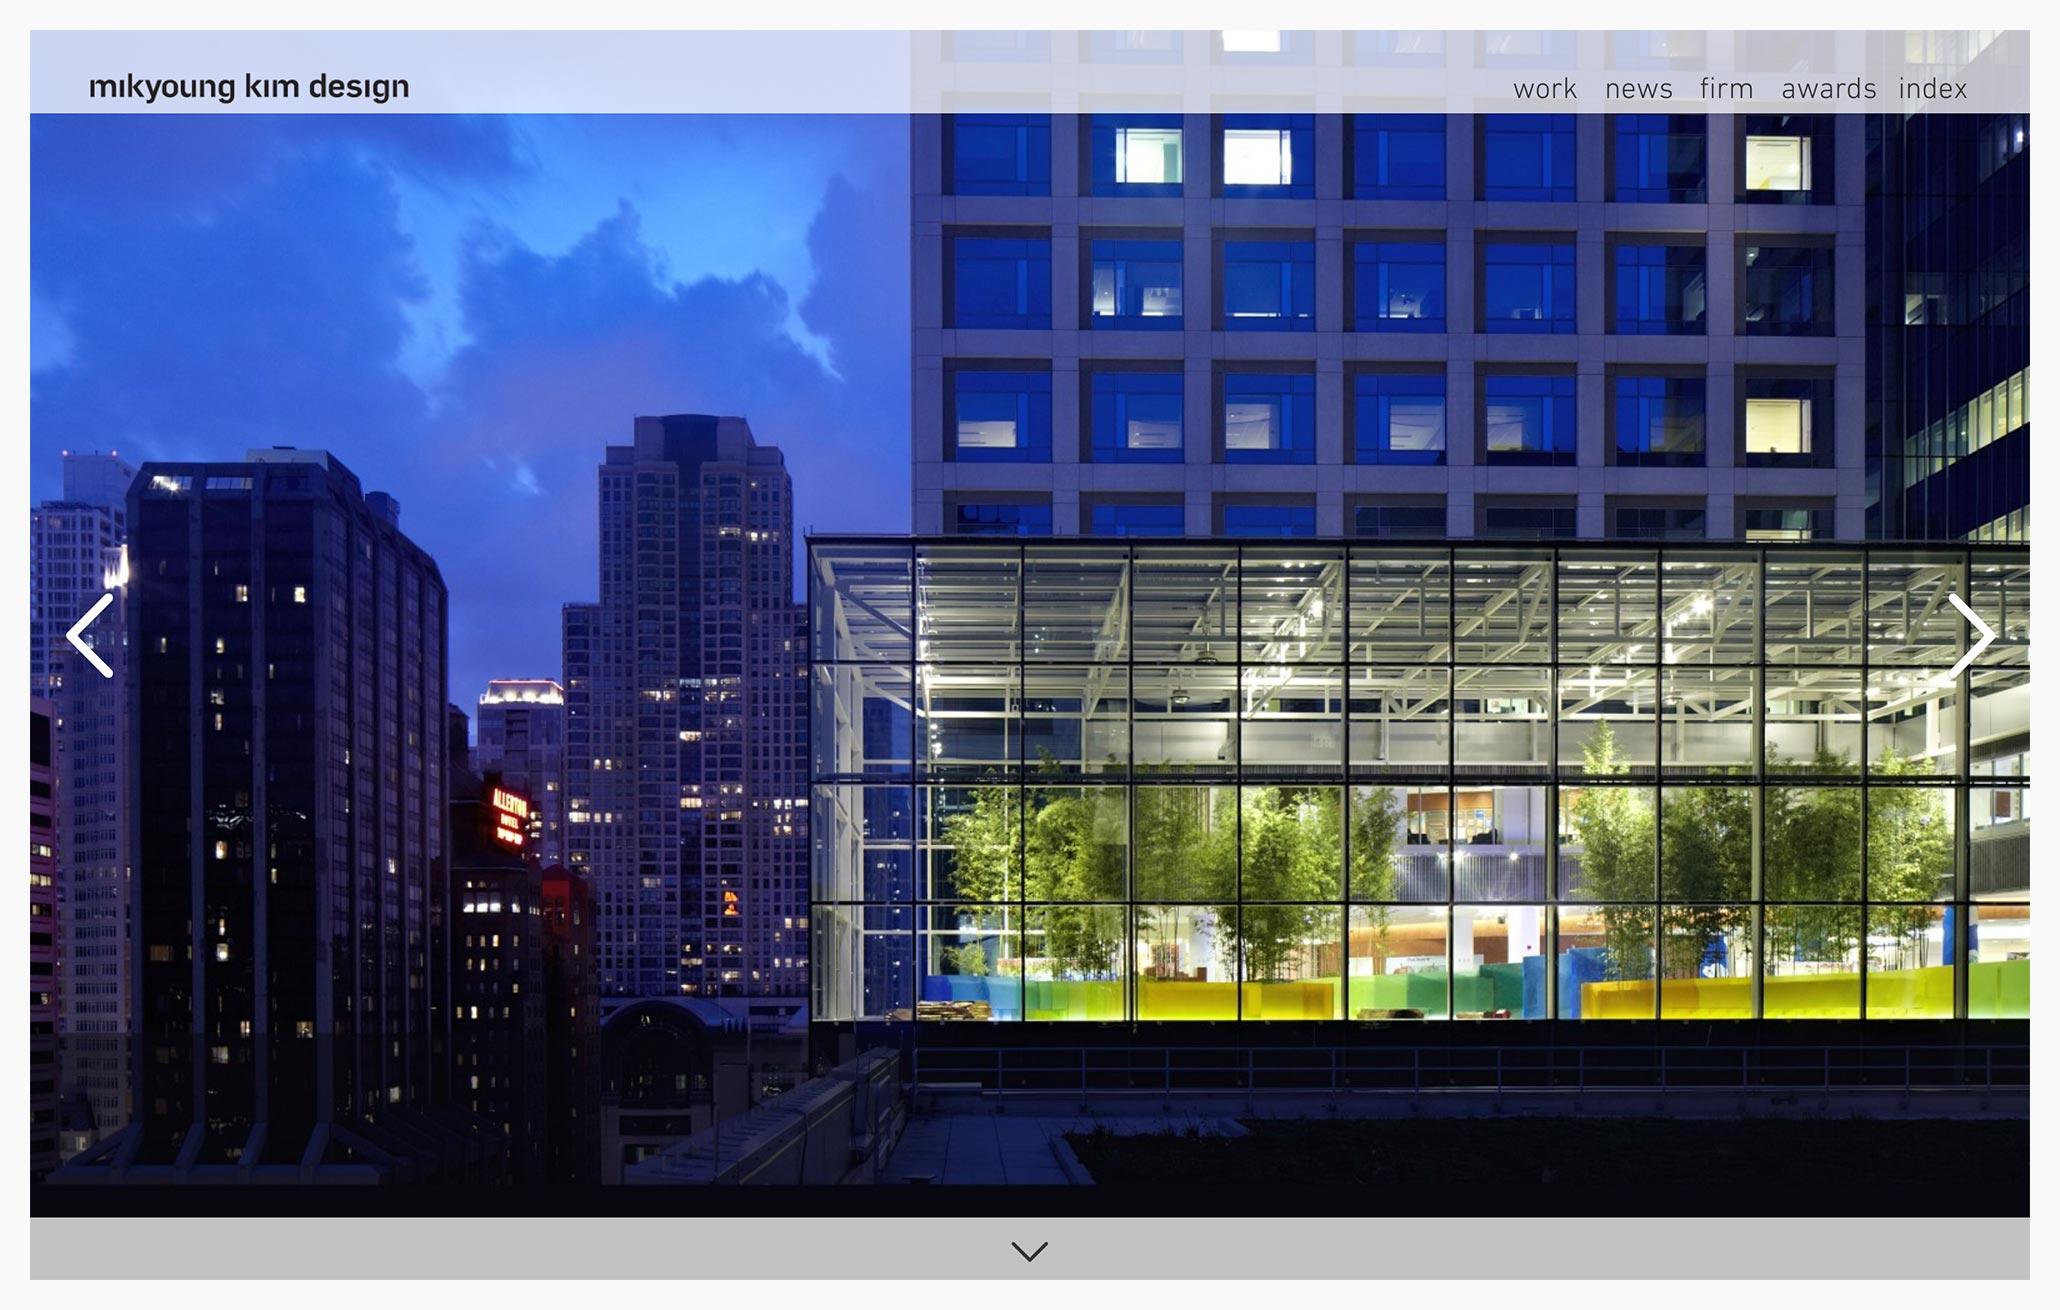 mikyoung kim design - Best Architecture Websites 2018